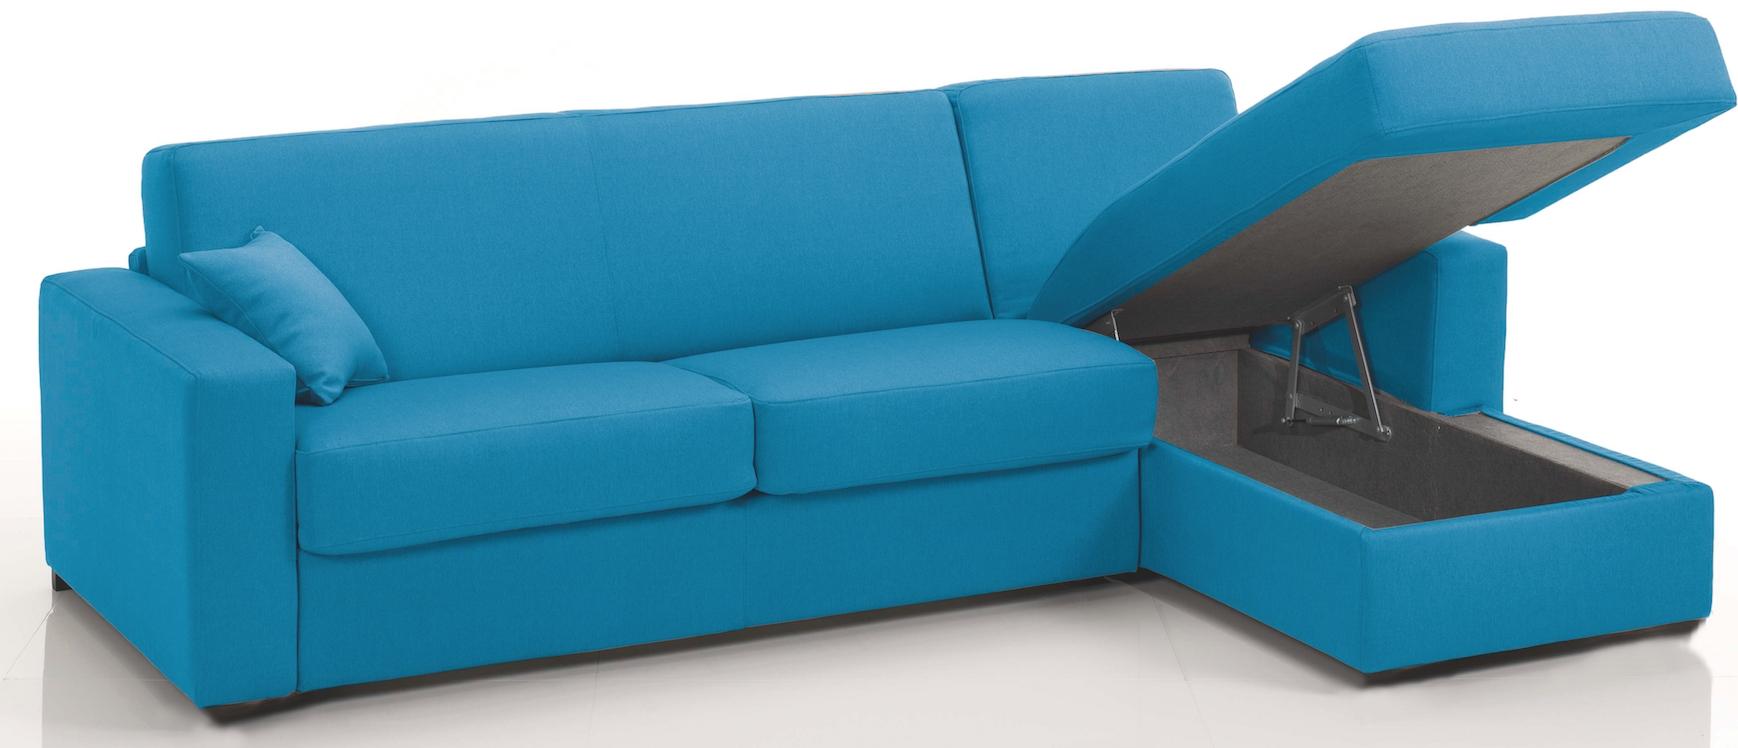 Canapé d\'angle convertible Rapido réversible Microfibre Bleu Sophia ...